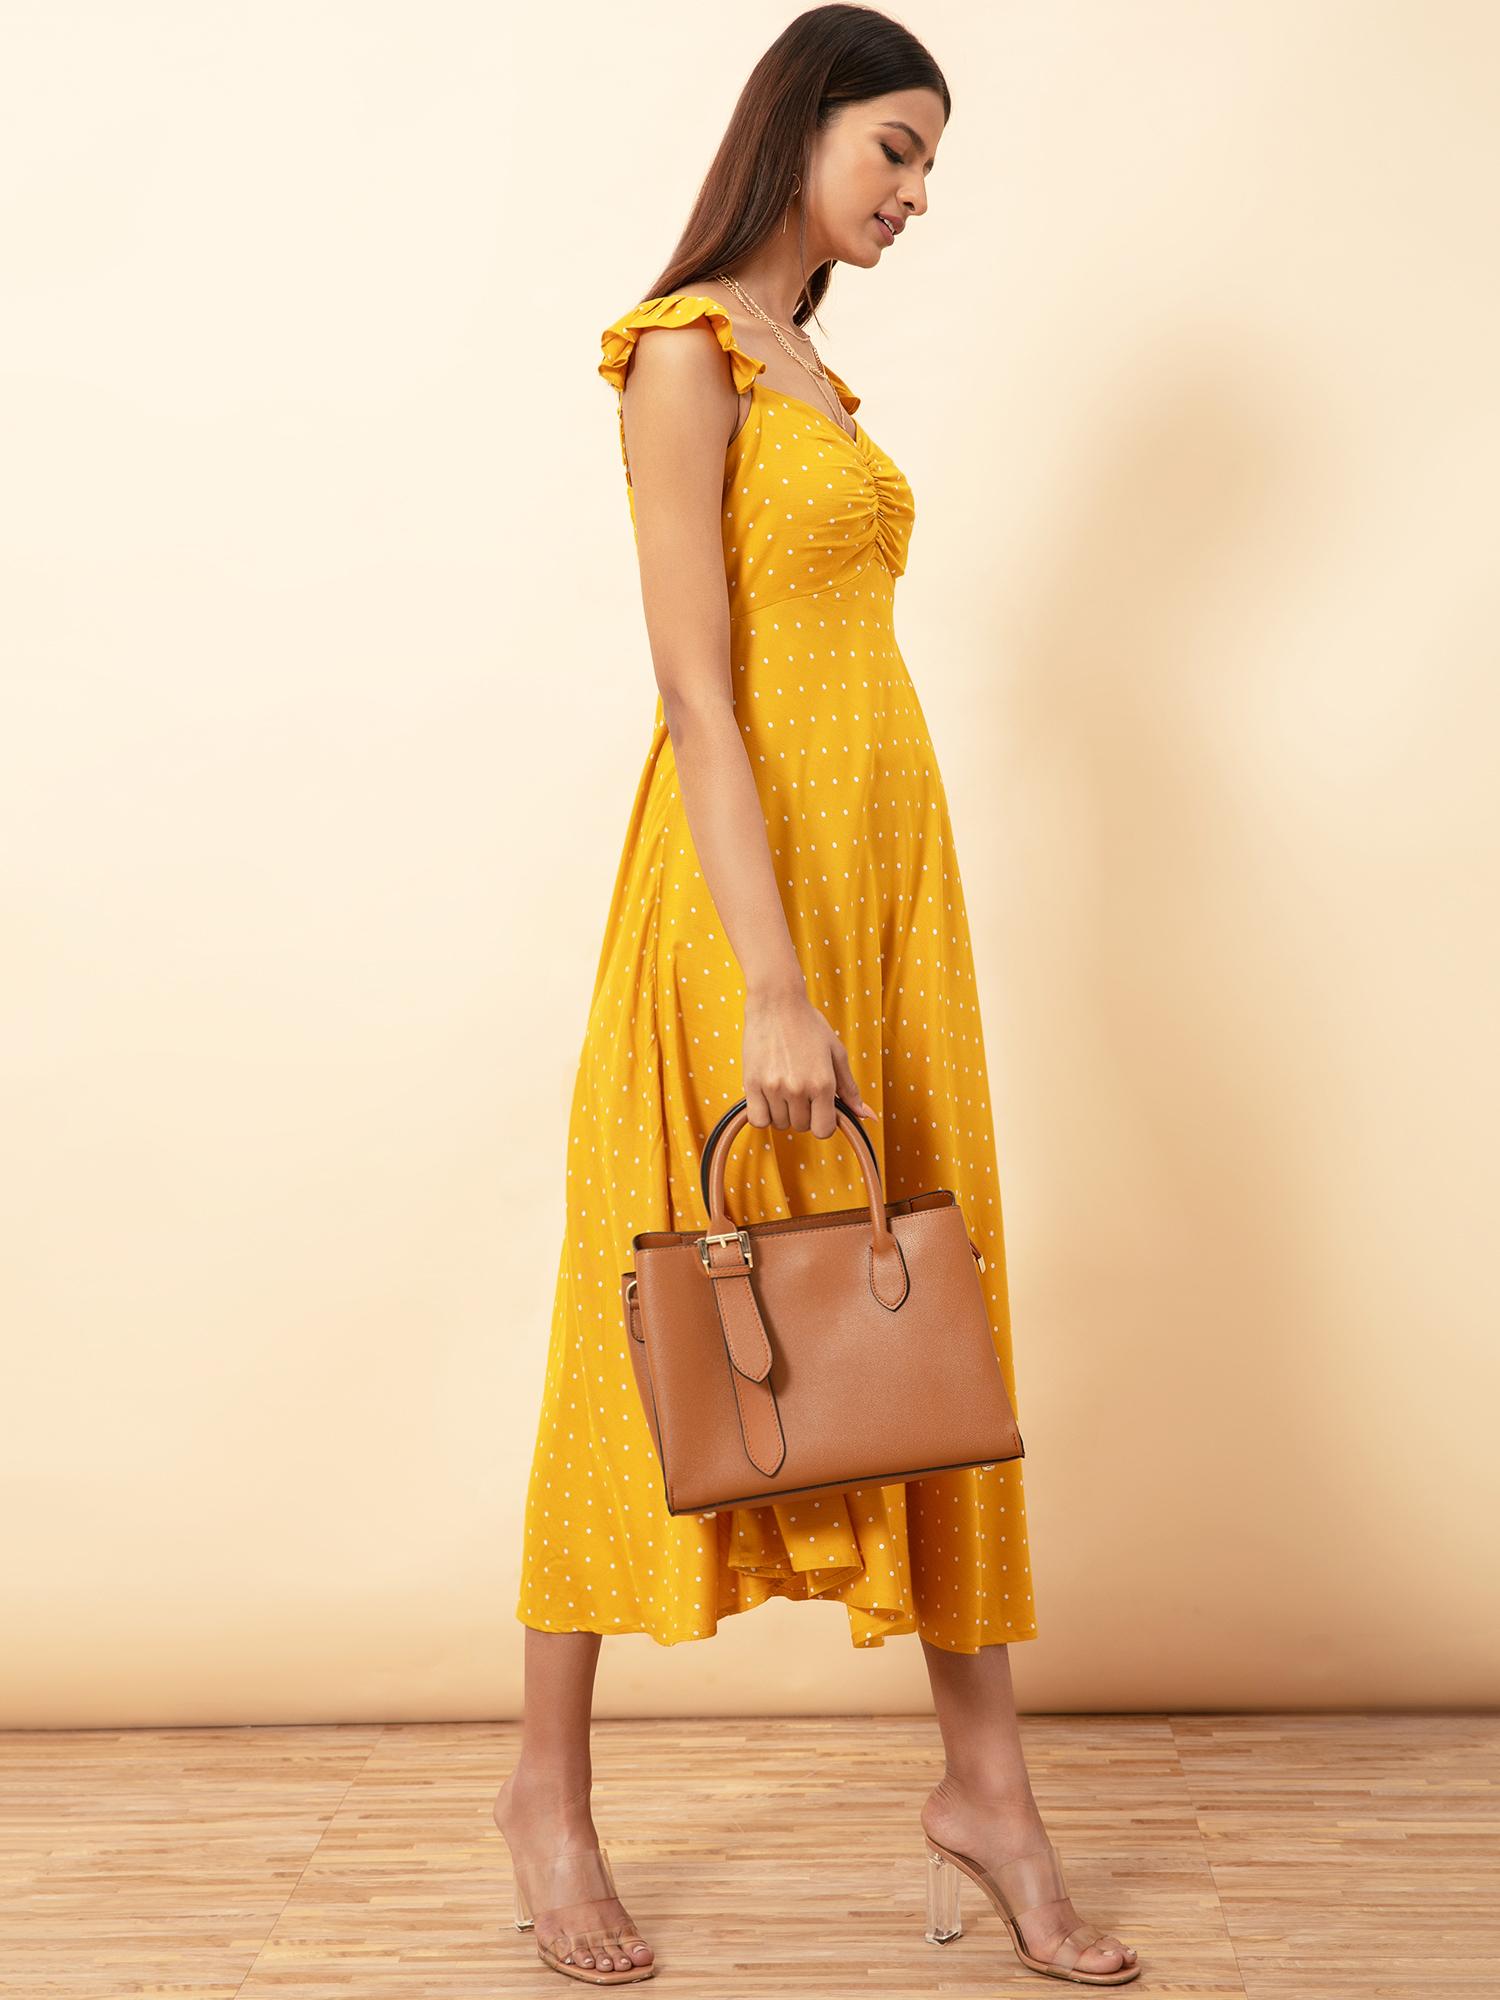 Dresses-Yellow The Polka Playful Midi Dress3